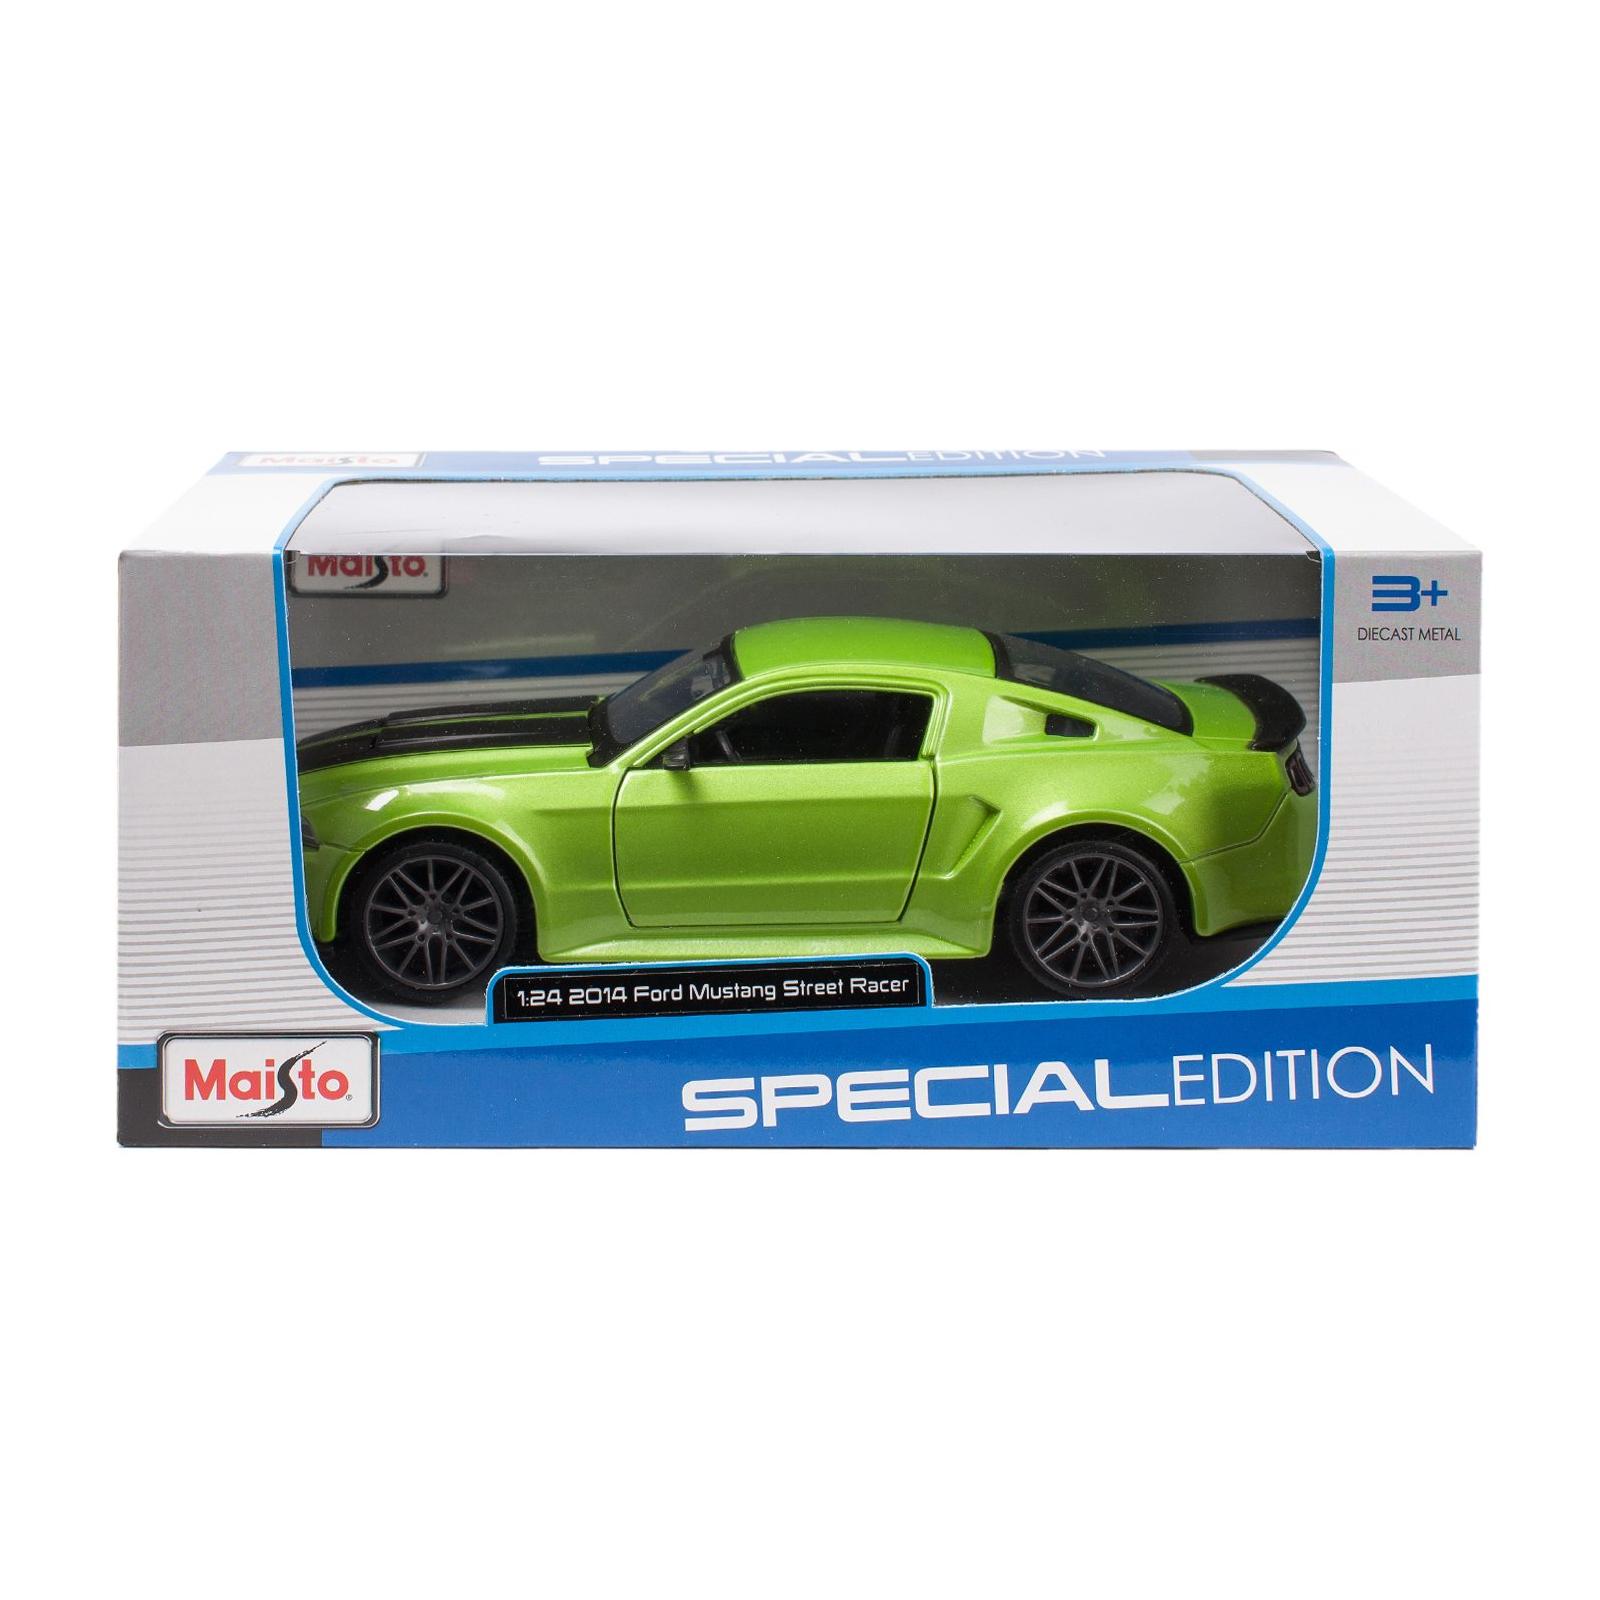 Машина Maisto Ford Mustang Street Racer 2014 (1:24) зеленый металлик (31506 met. green) изображение 5